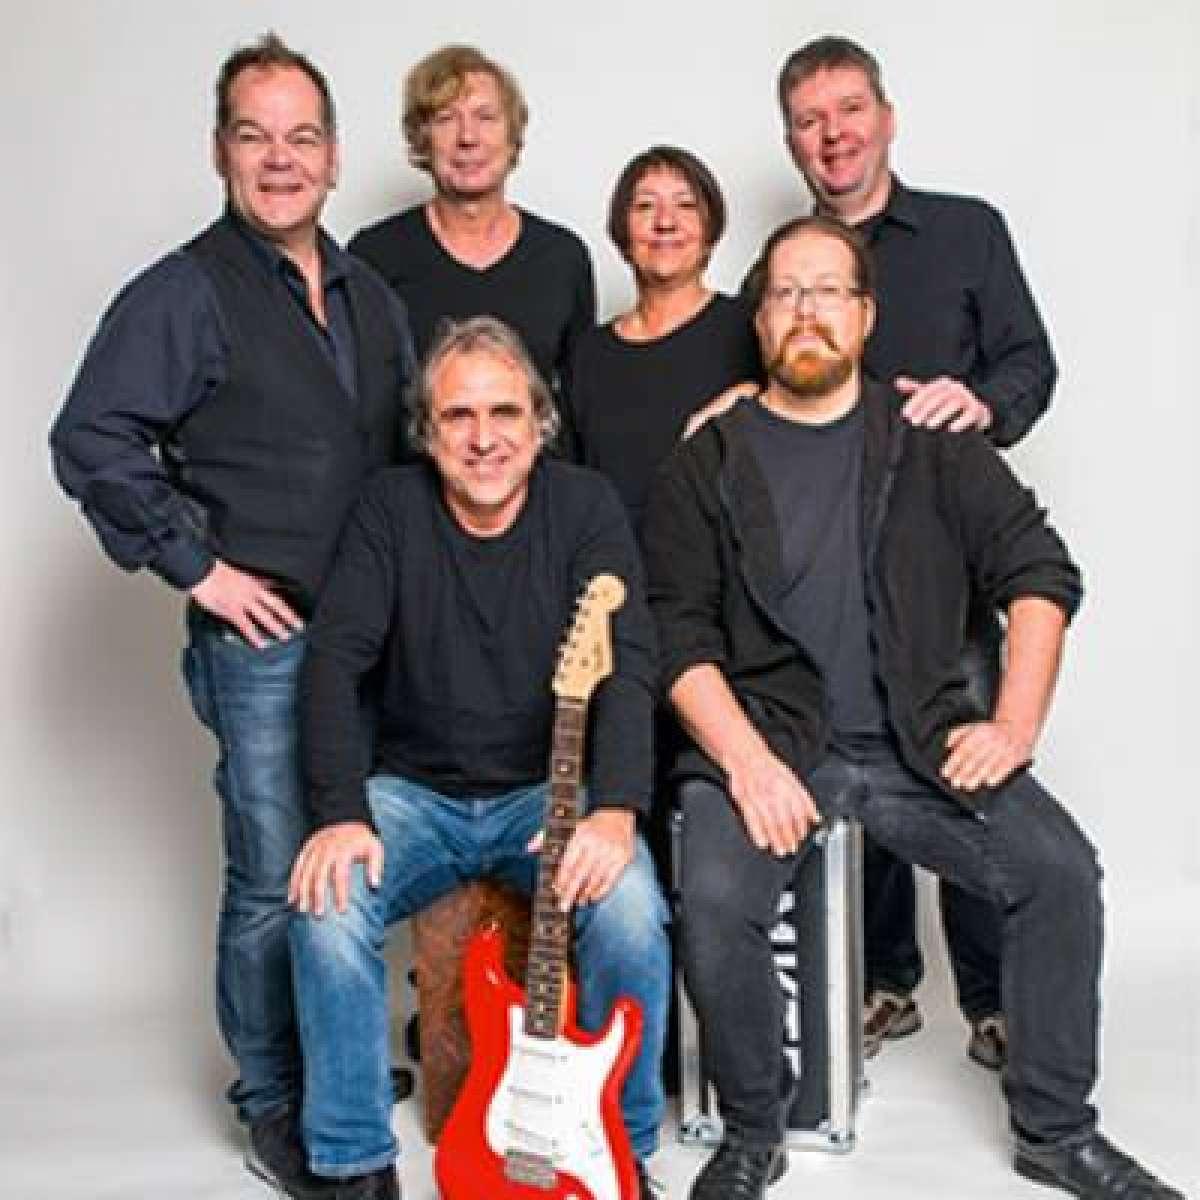 Mark Knopfler Tribute Band - Theaterstübchen - Kassel